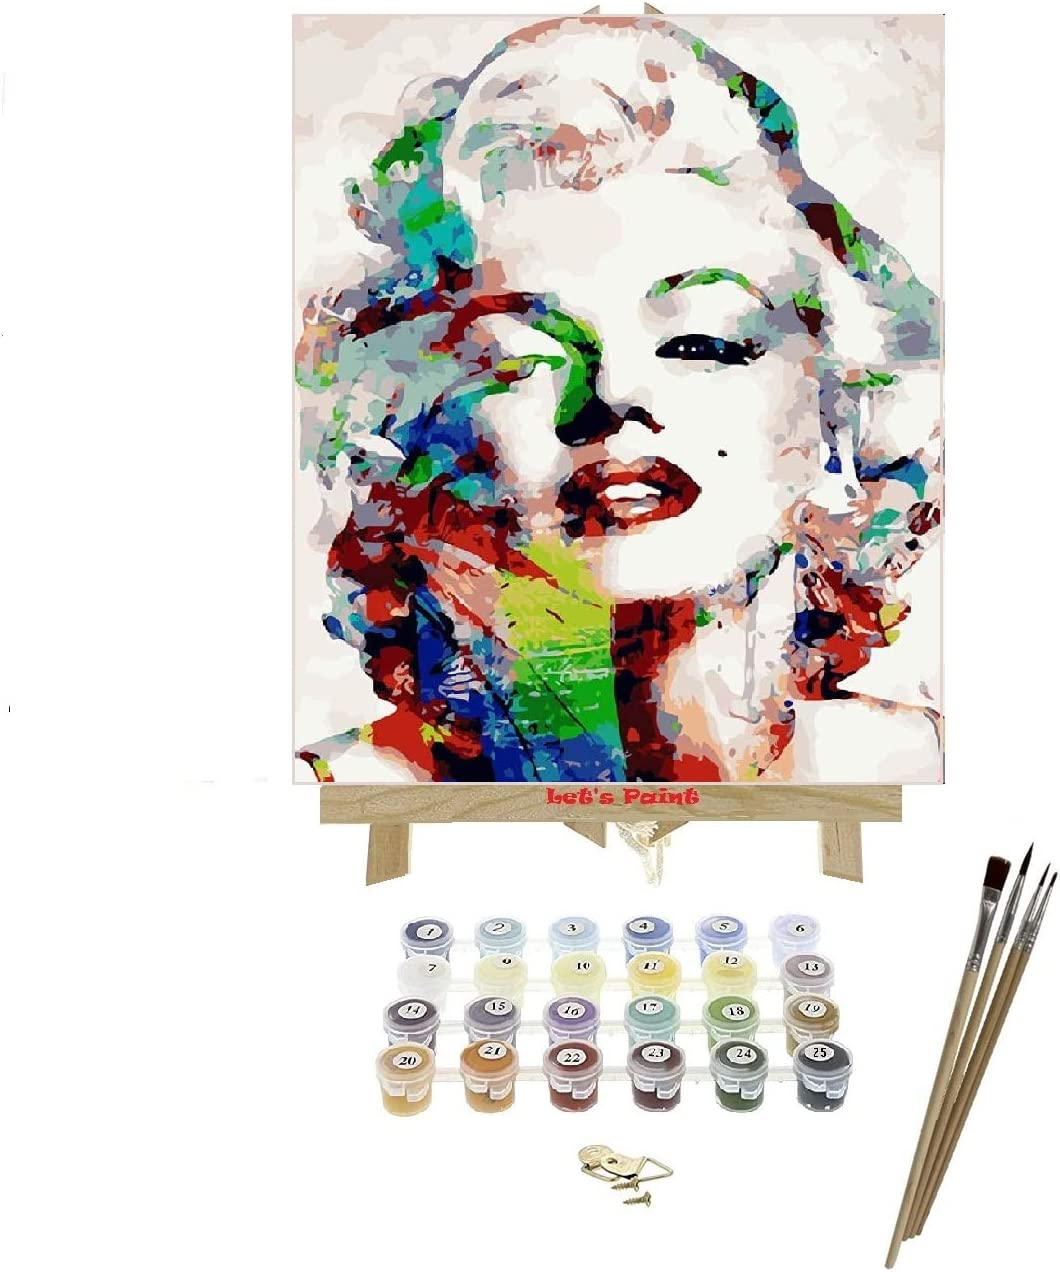 Pintura por números + atril + kit pintura 41x51 cm Marilyn